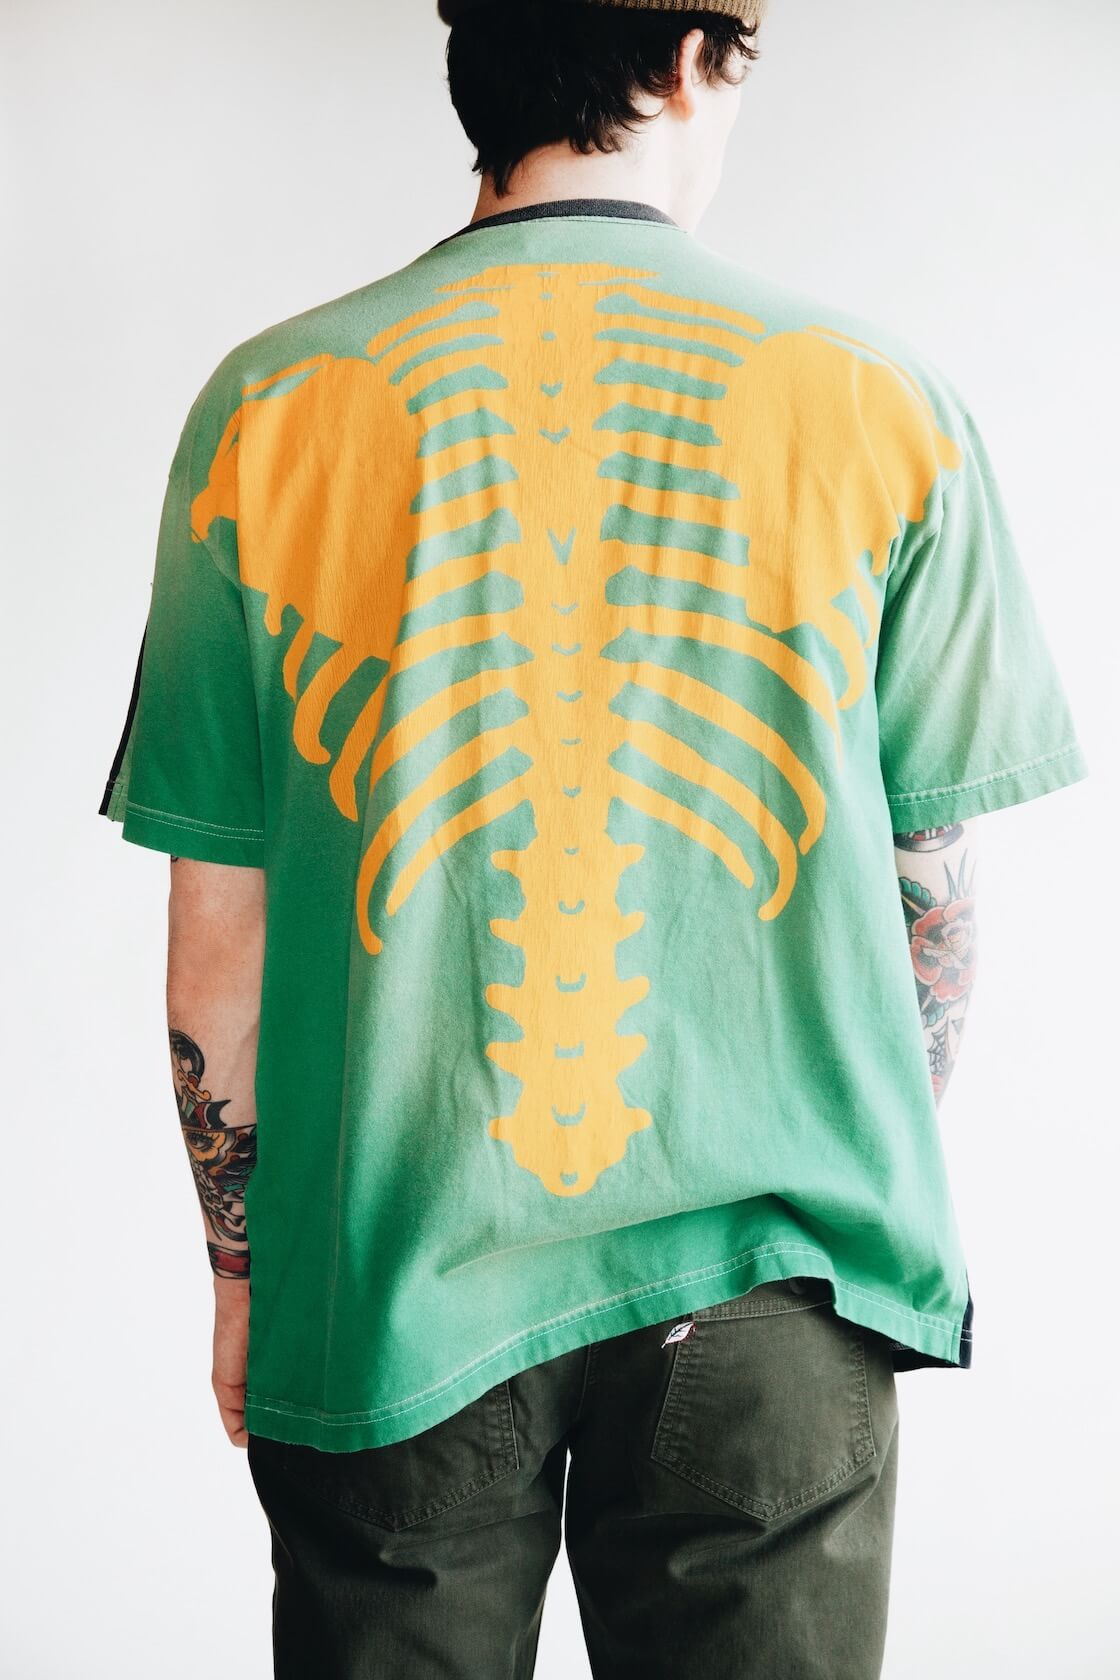 kapital kountry bones tee in green and orange on body